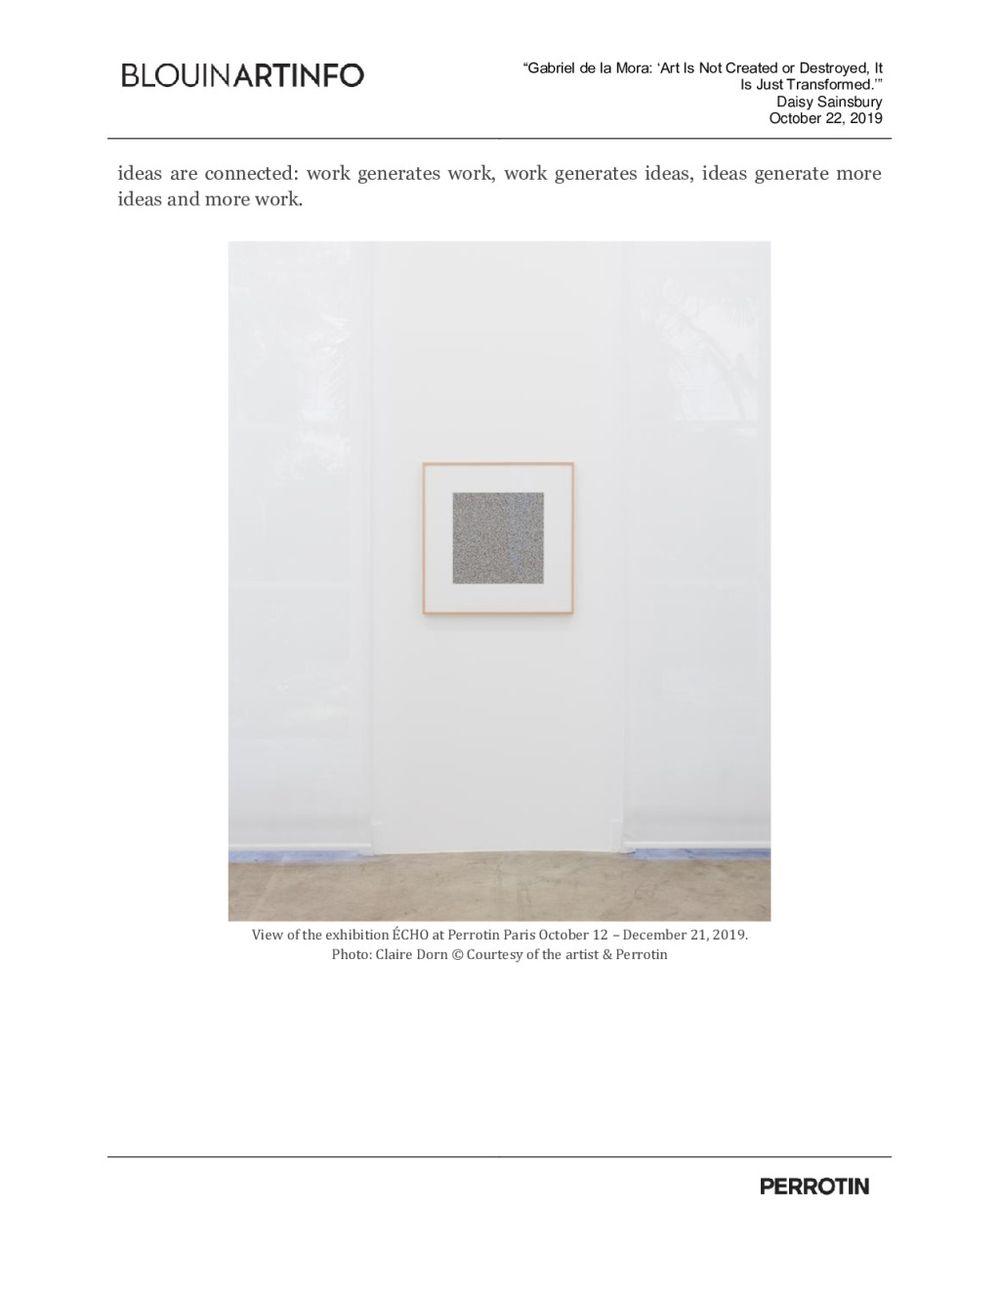 BLOUINARTINFO | Gabriel DE LA MORA